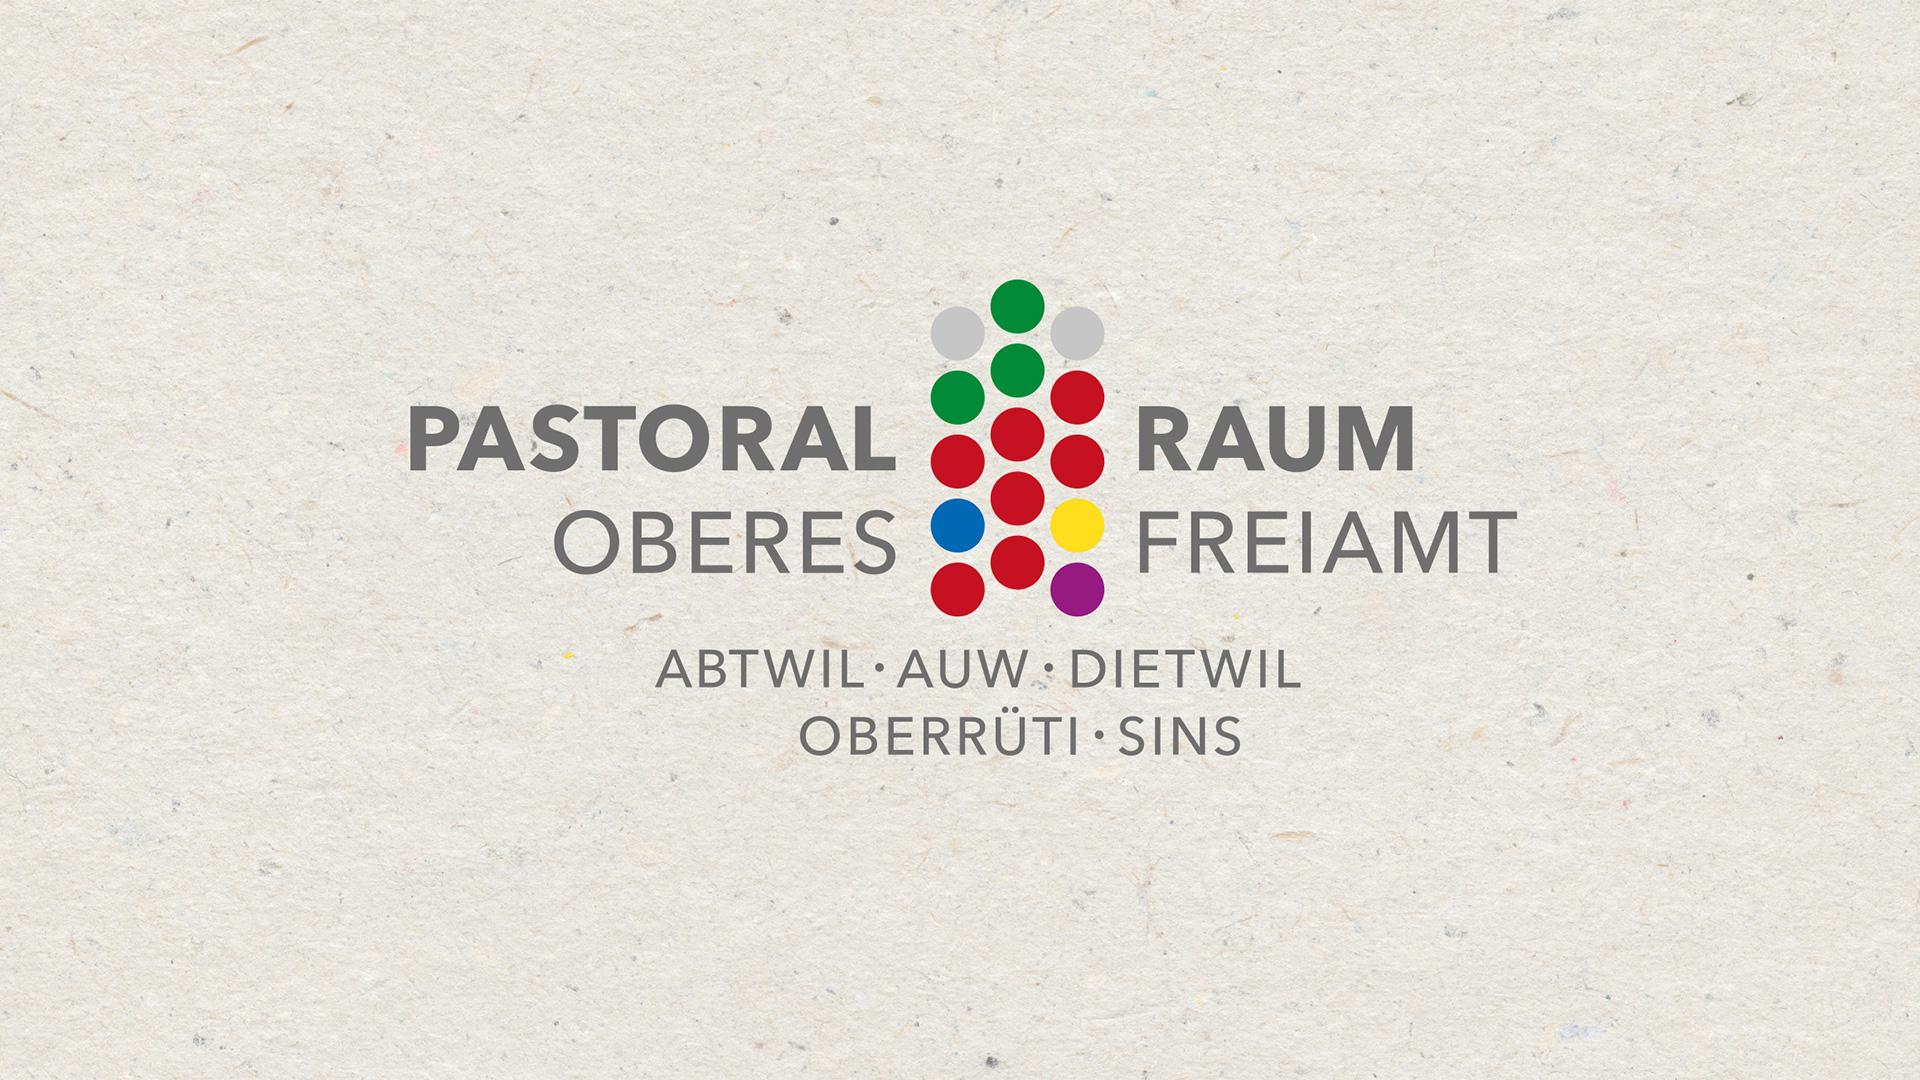 Pastoralraum Oberes Freiamt